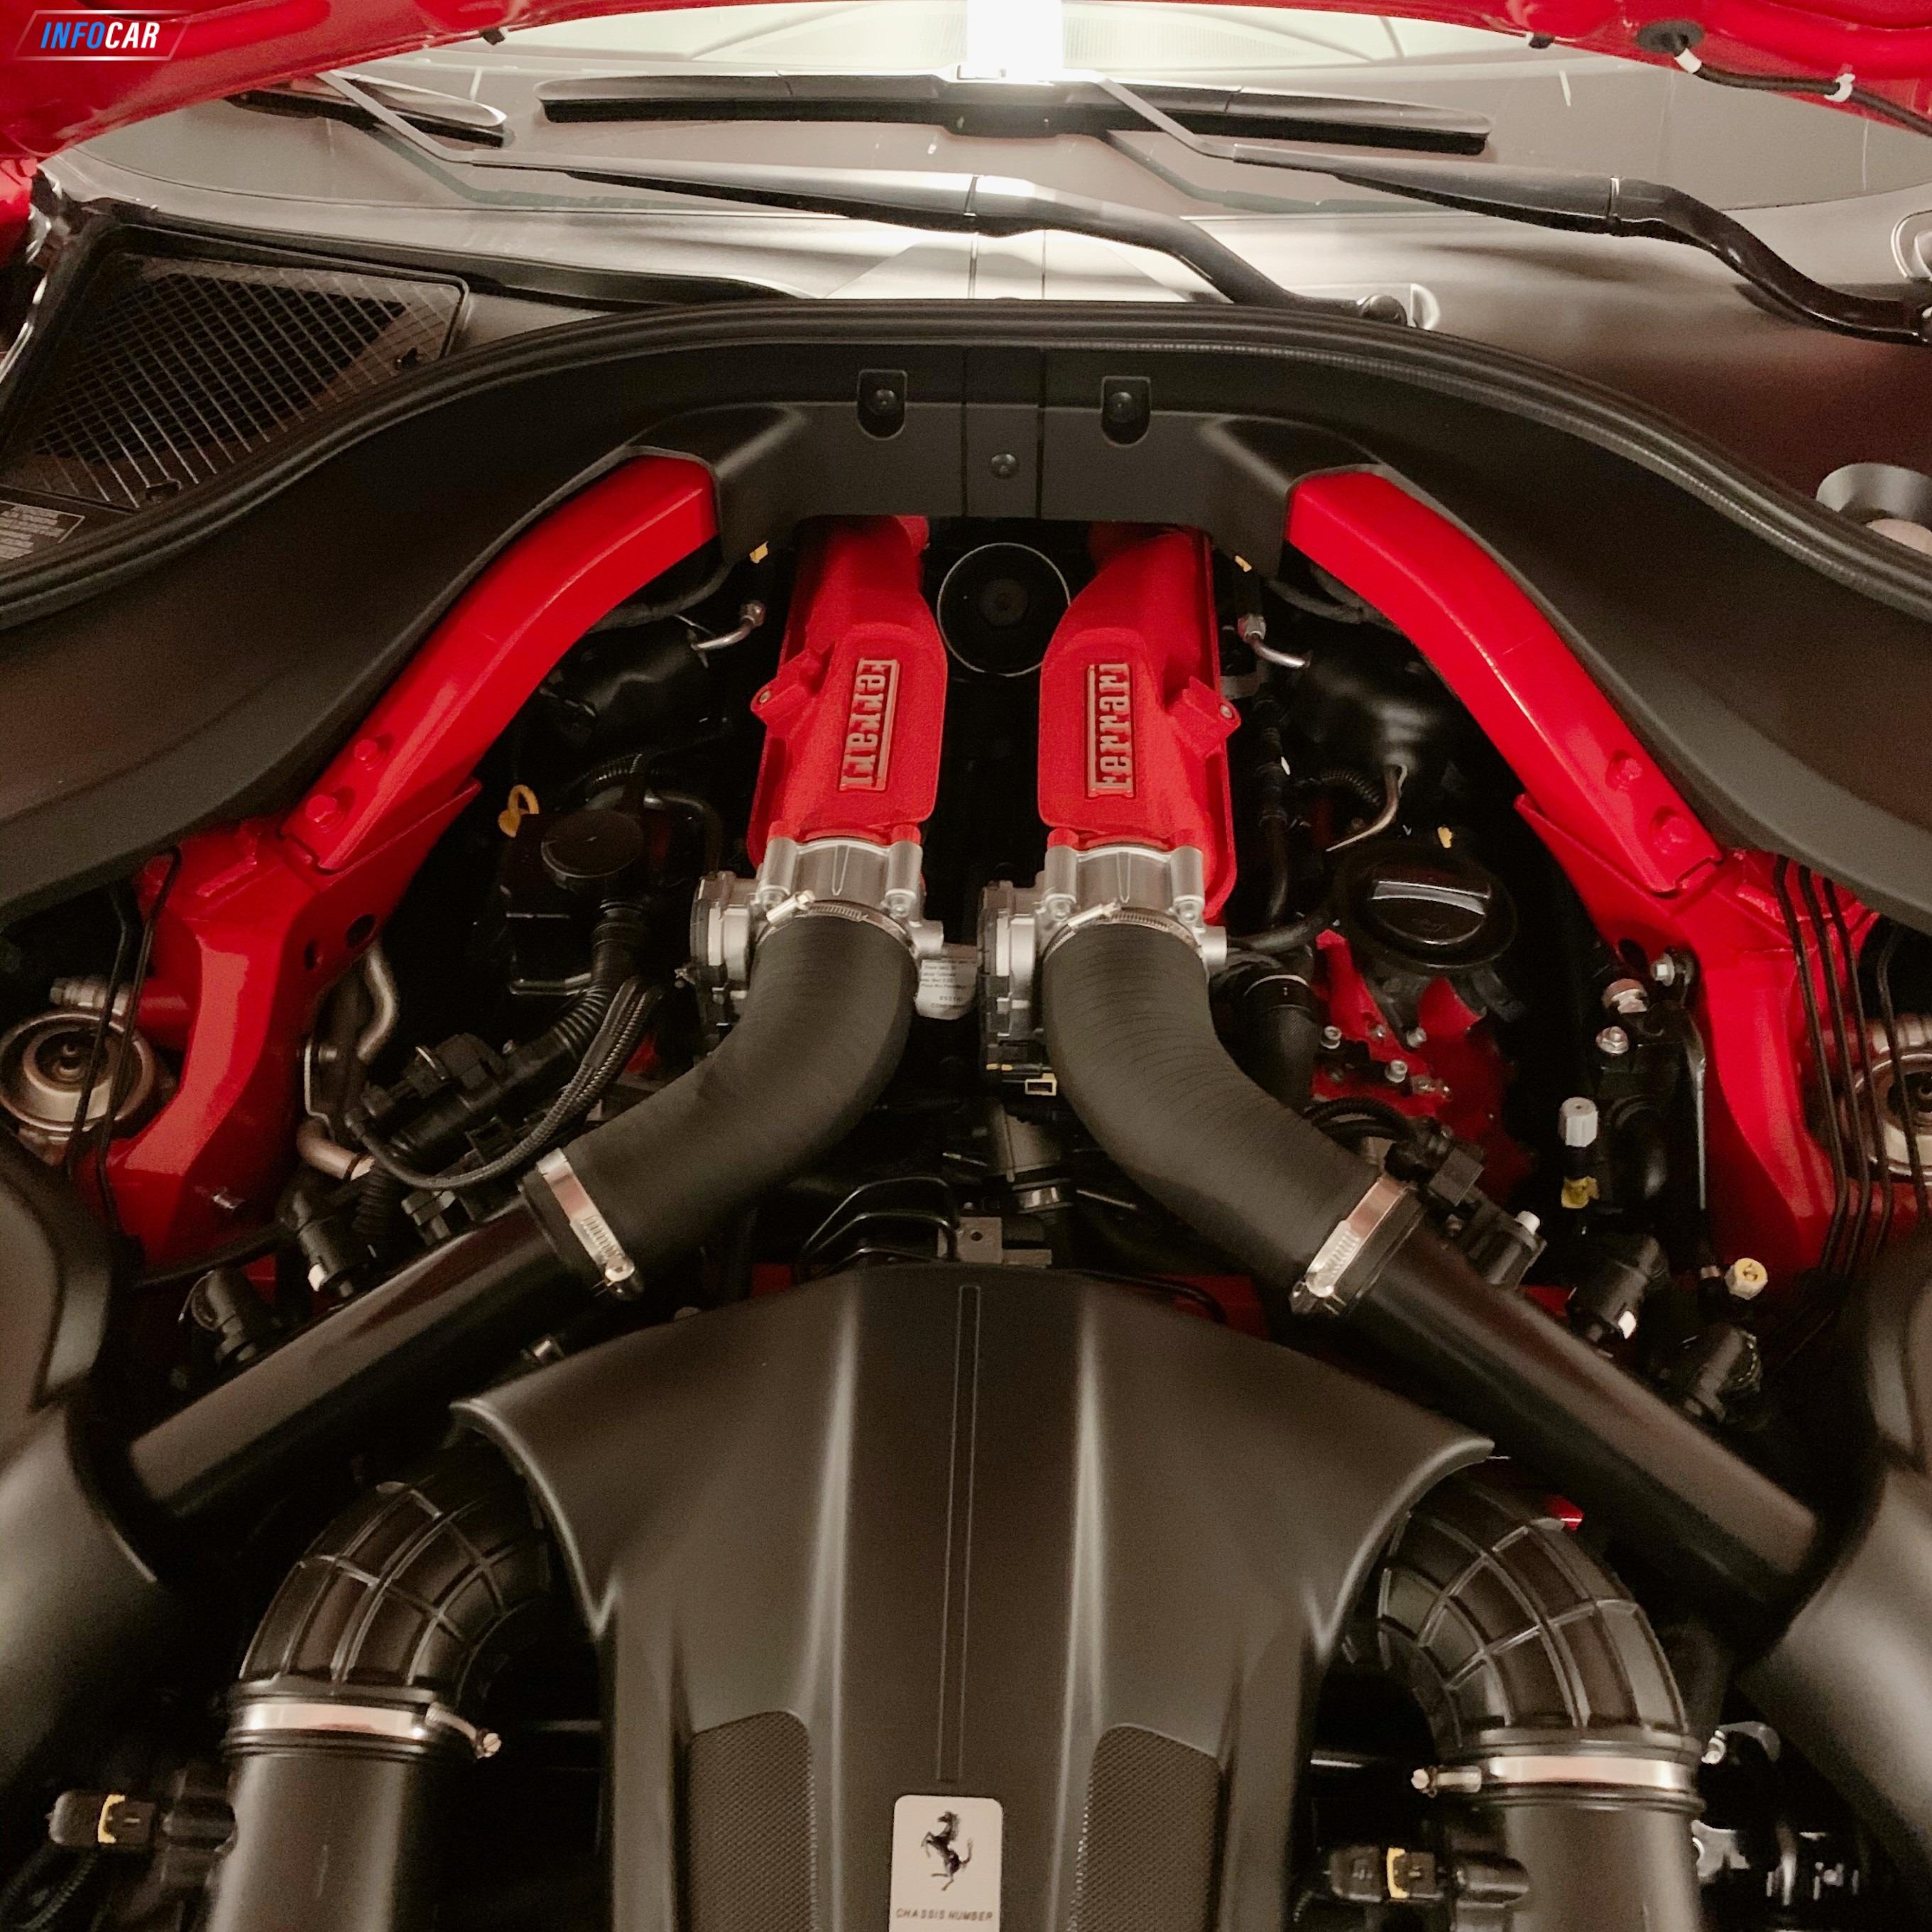 2019 Ferrari California Potofino - INFOCAR - Toronto's Most Comprehensive New and Used Auto Trading Platform